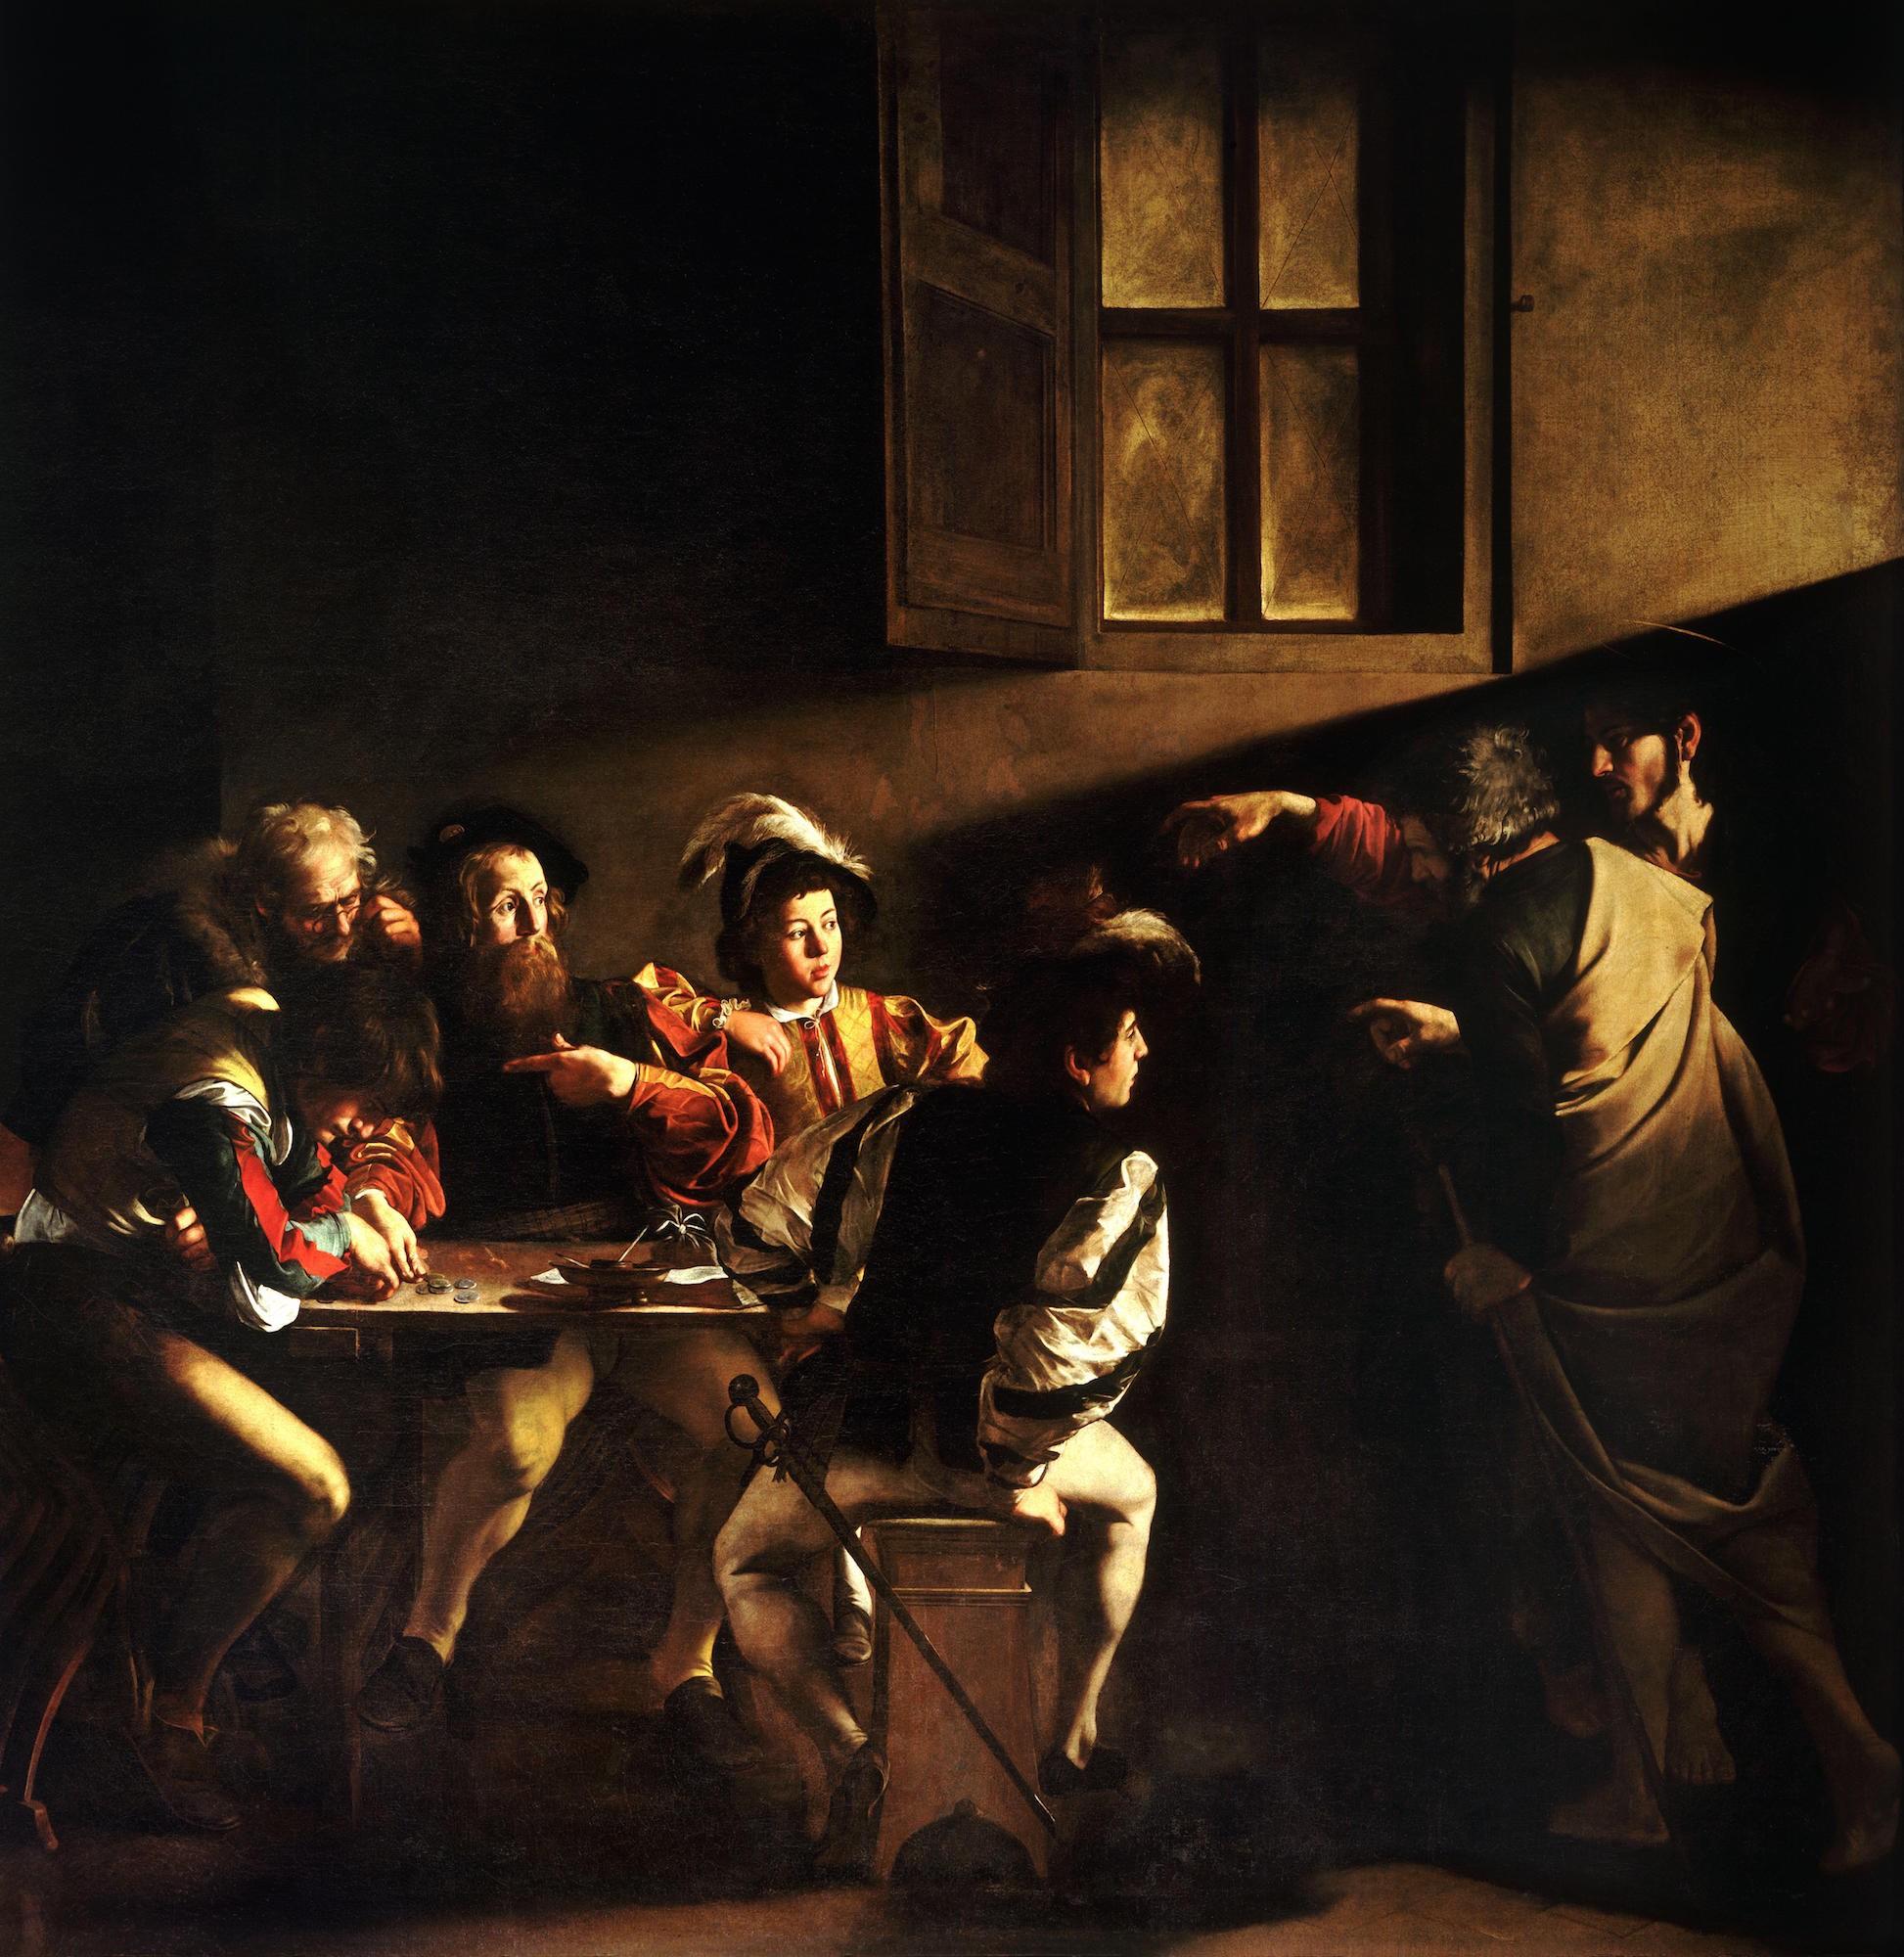 The_Calling_of_Saint_Matthew-Caravaggio_1599-1600